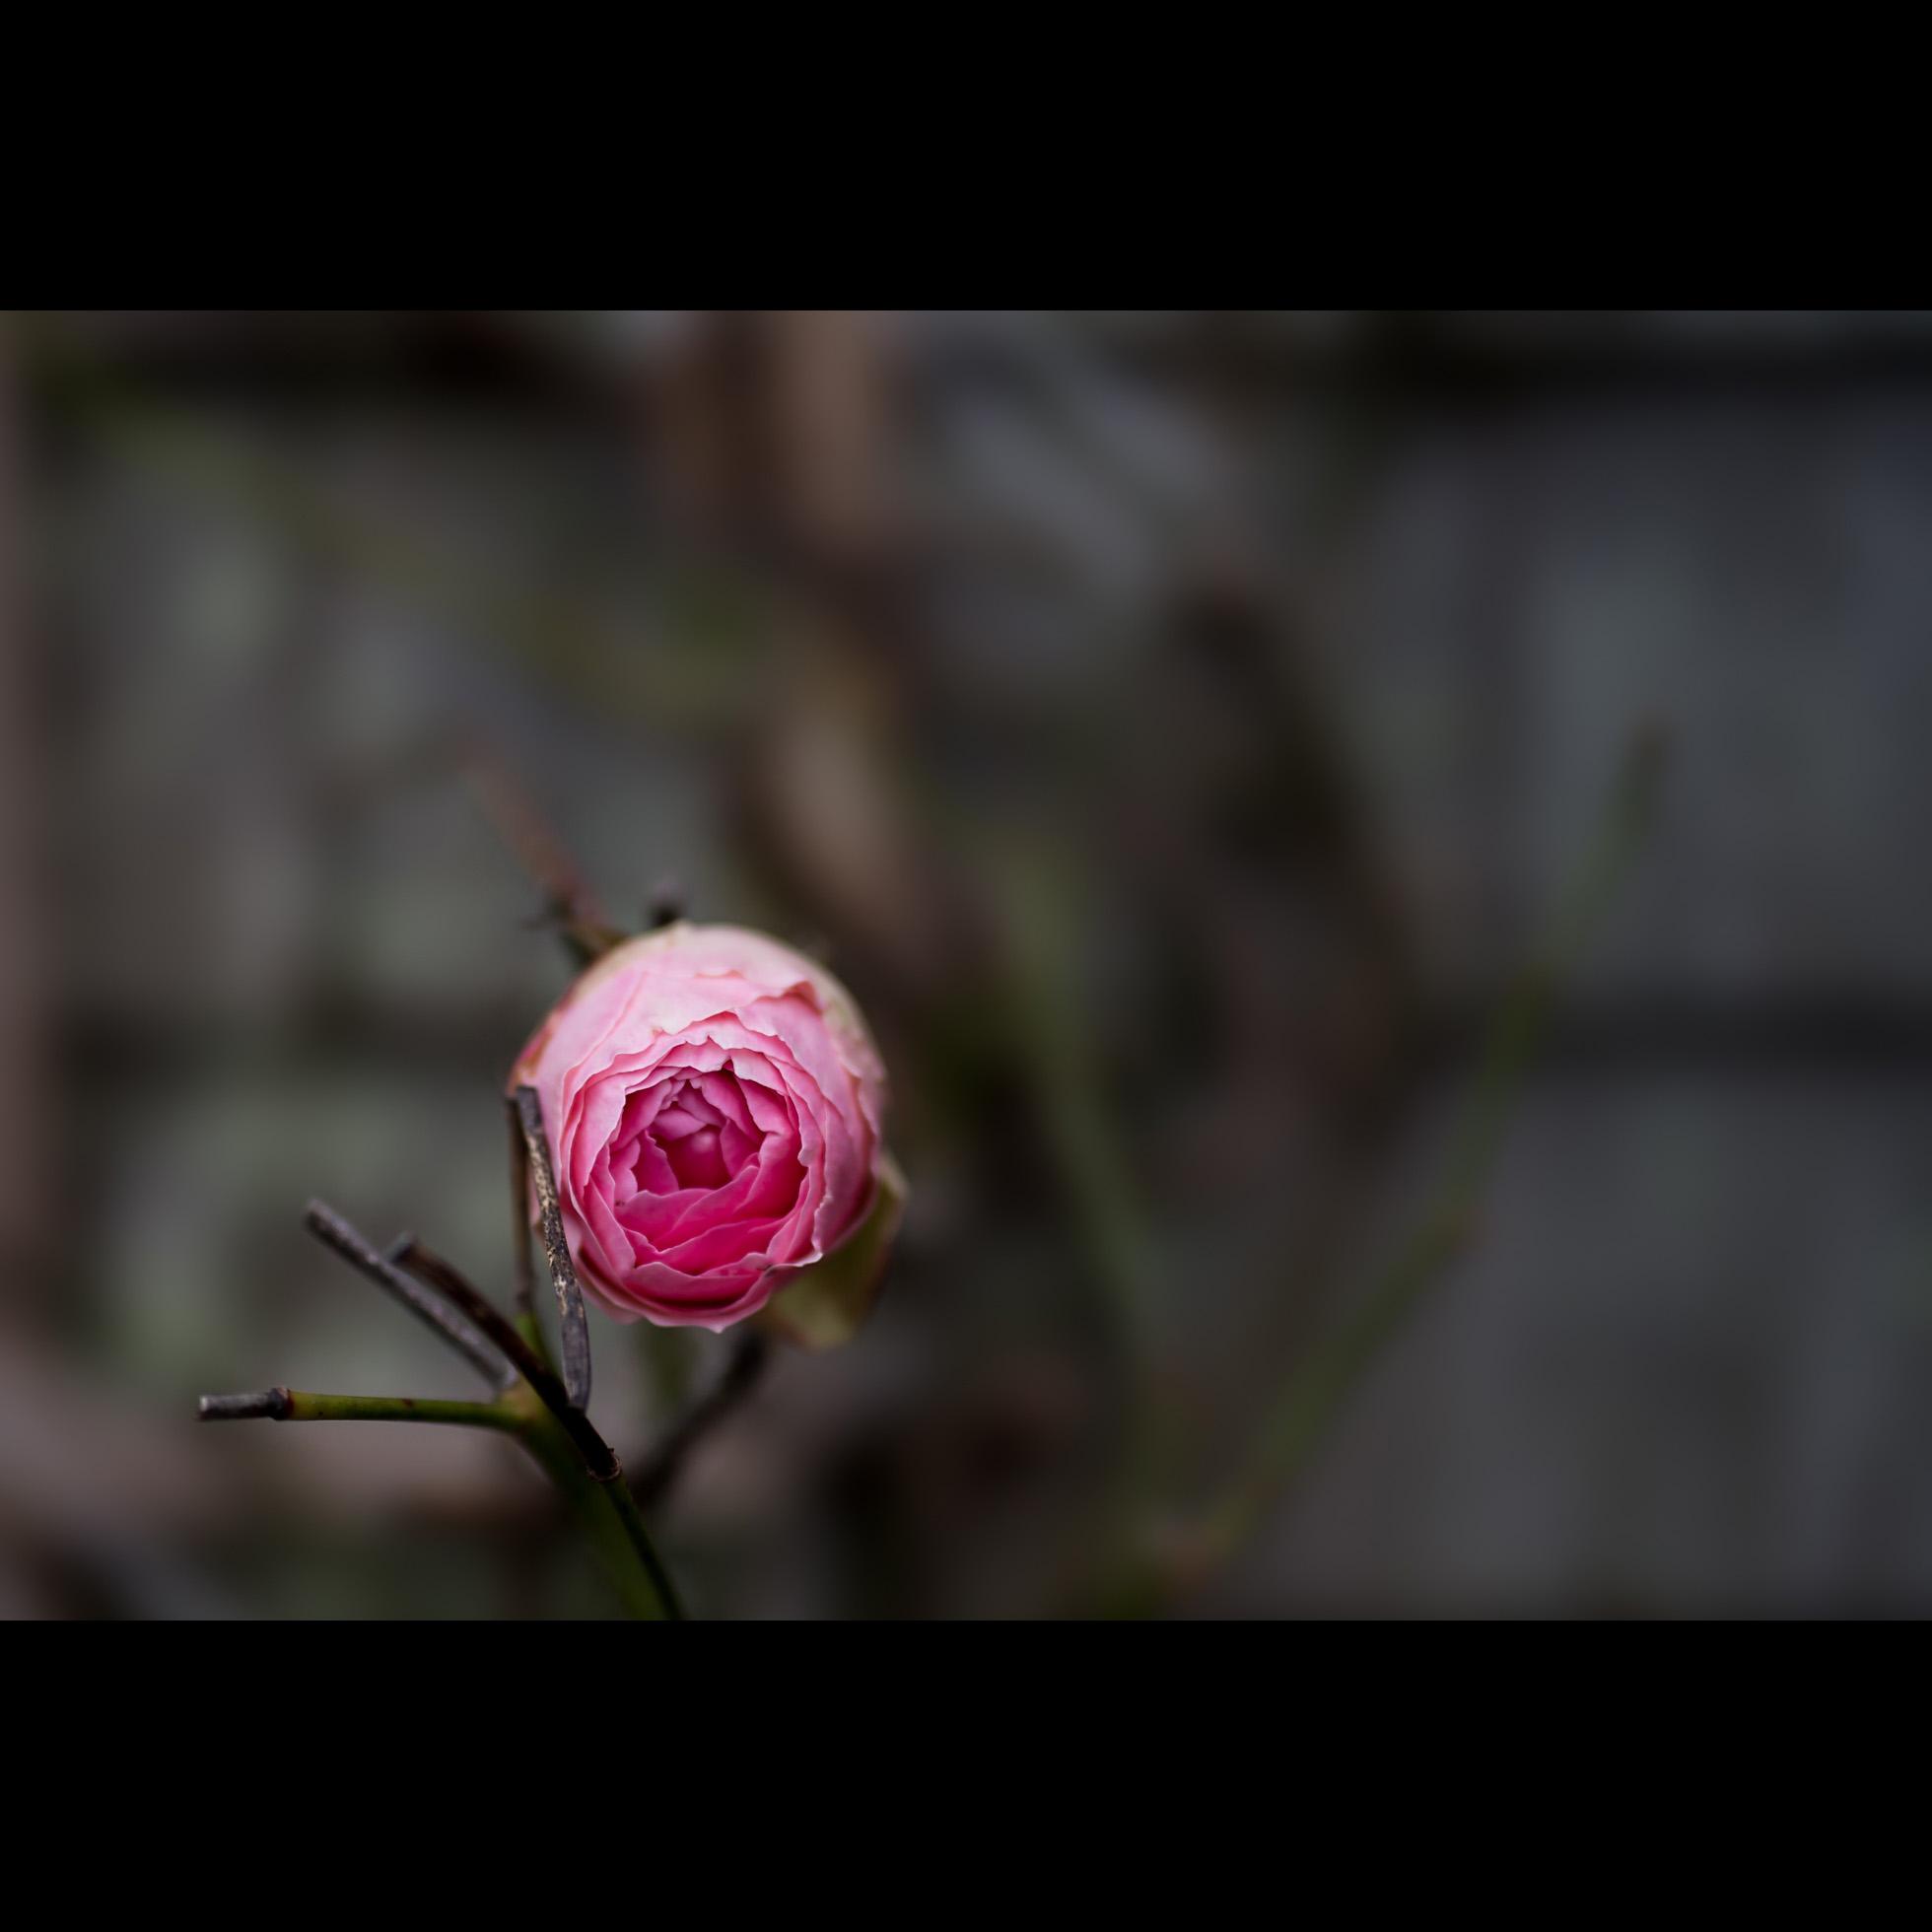 1.4 ROSE FOR A GIRL